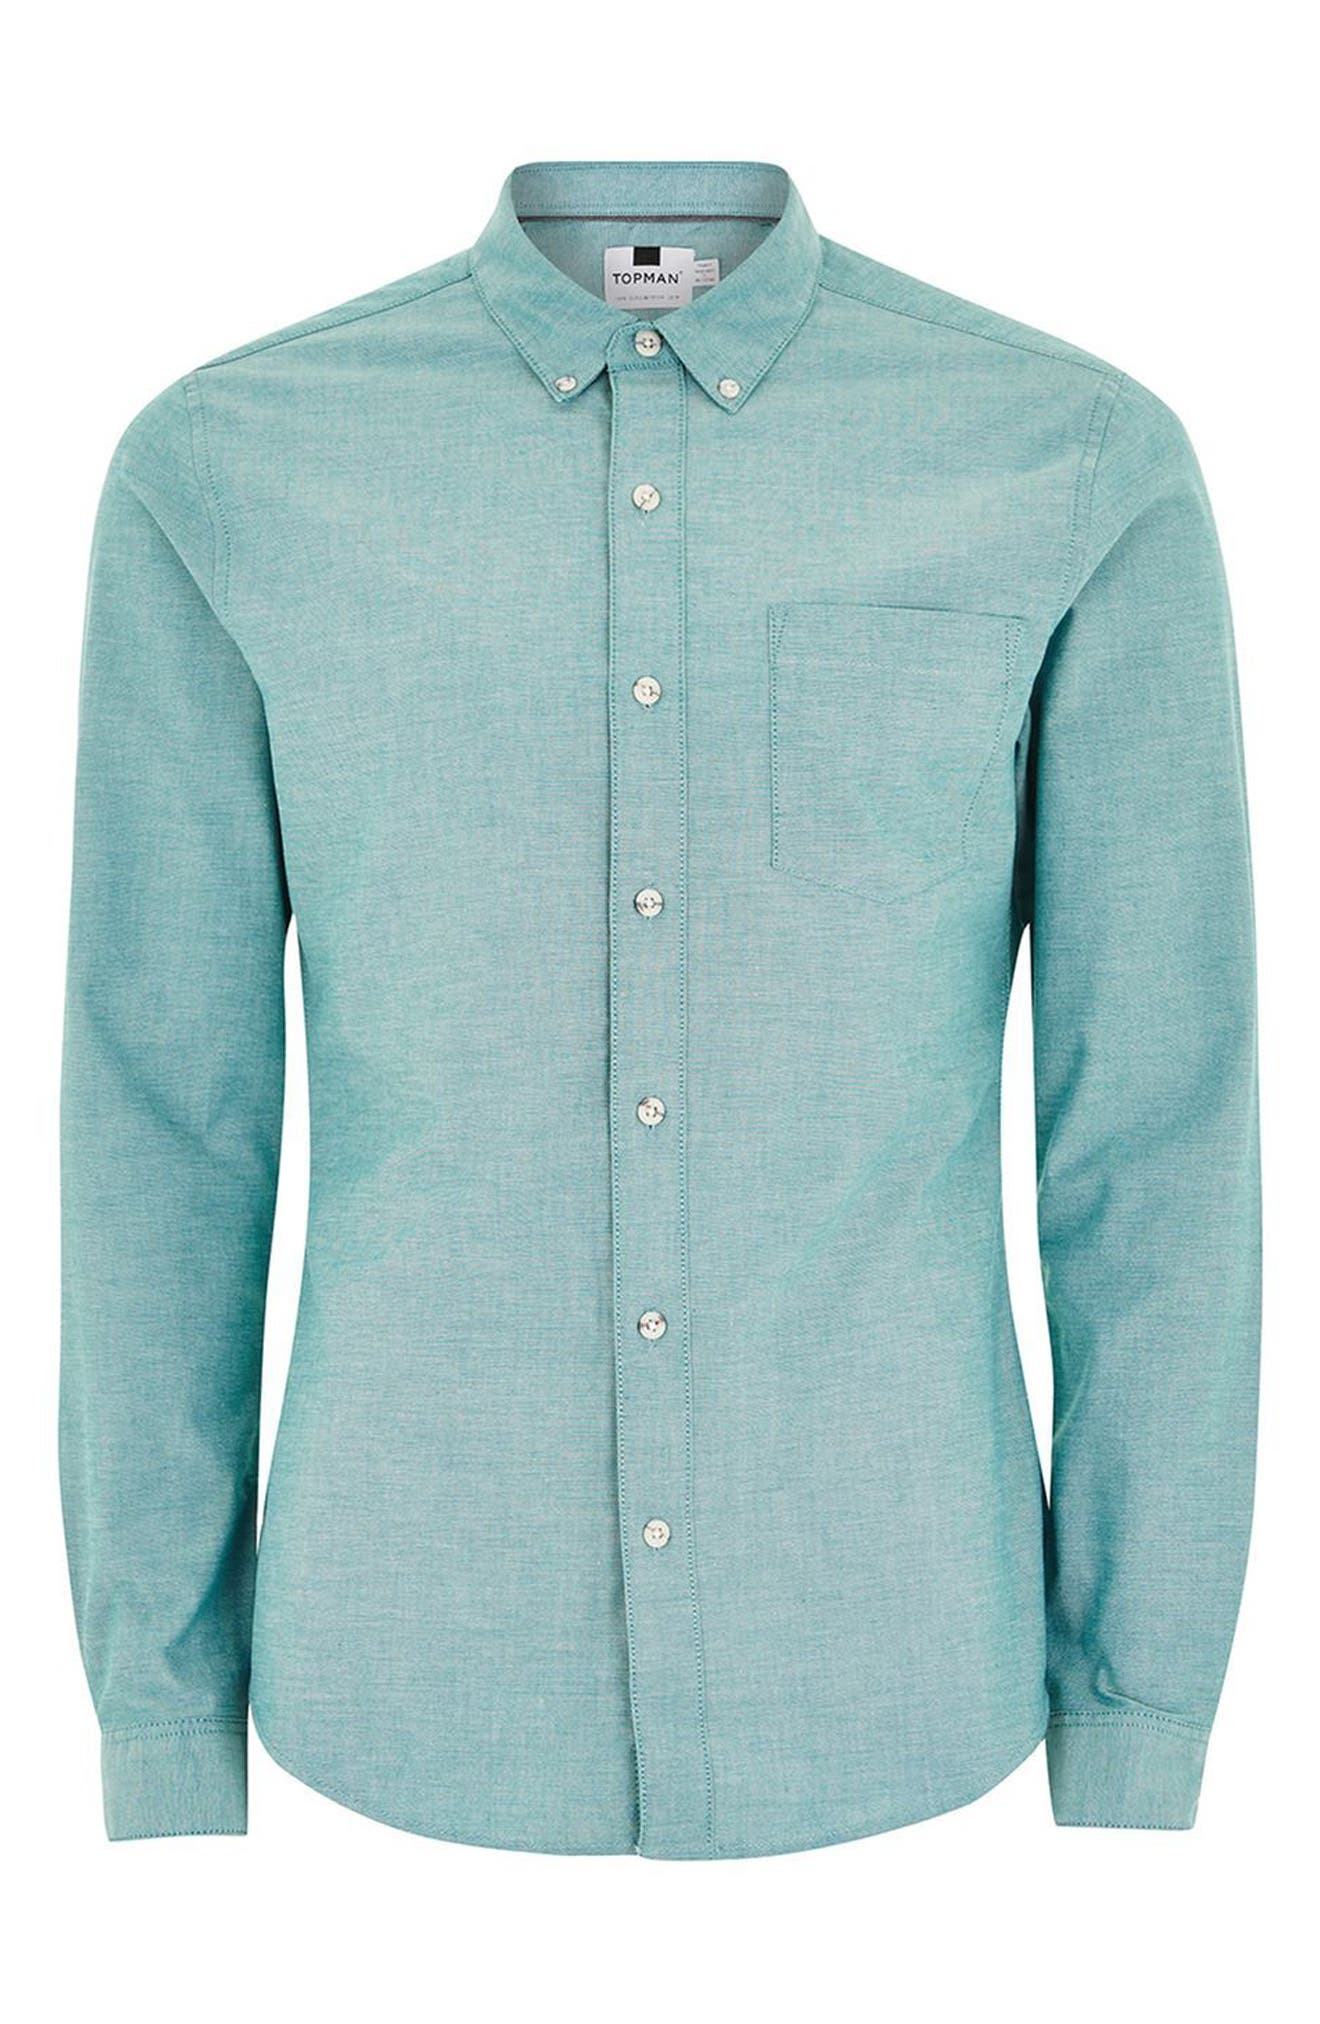 Muscle Fit Oxford Shirt,                             Alternate thumbnail 4, color,                             Blue